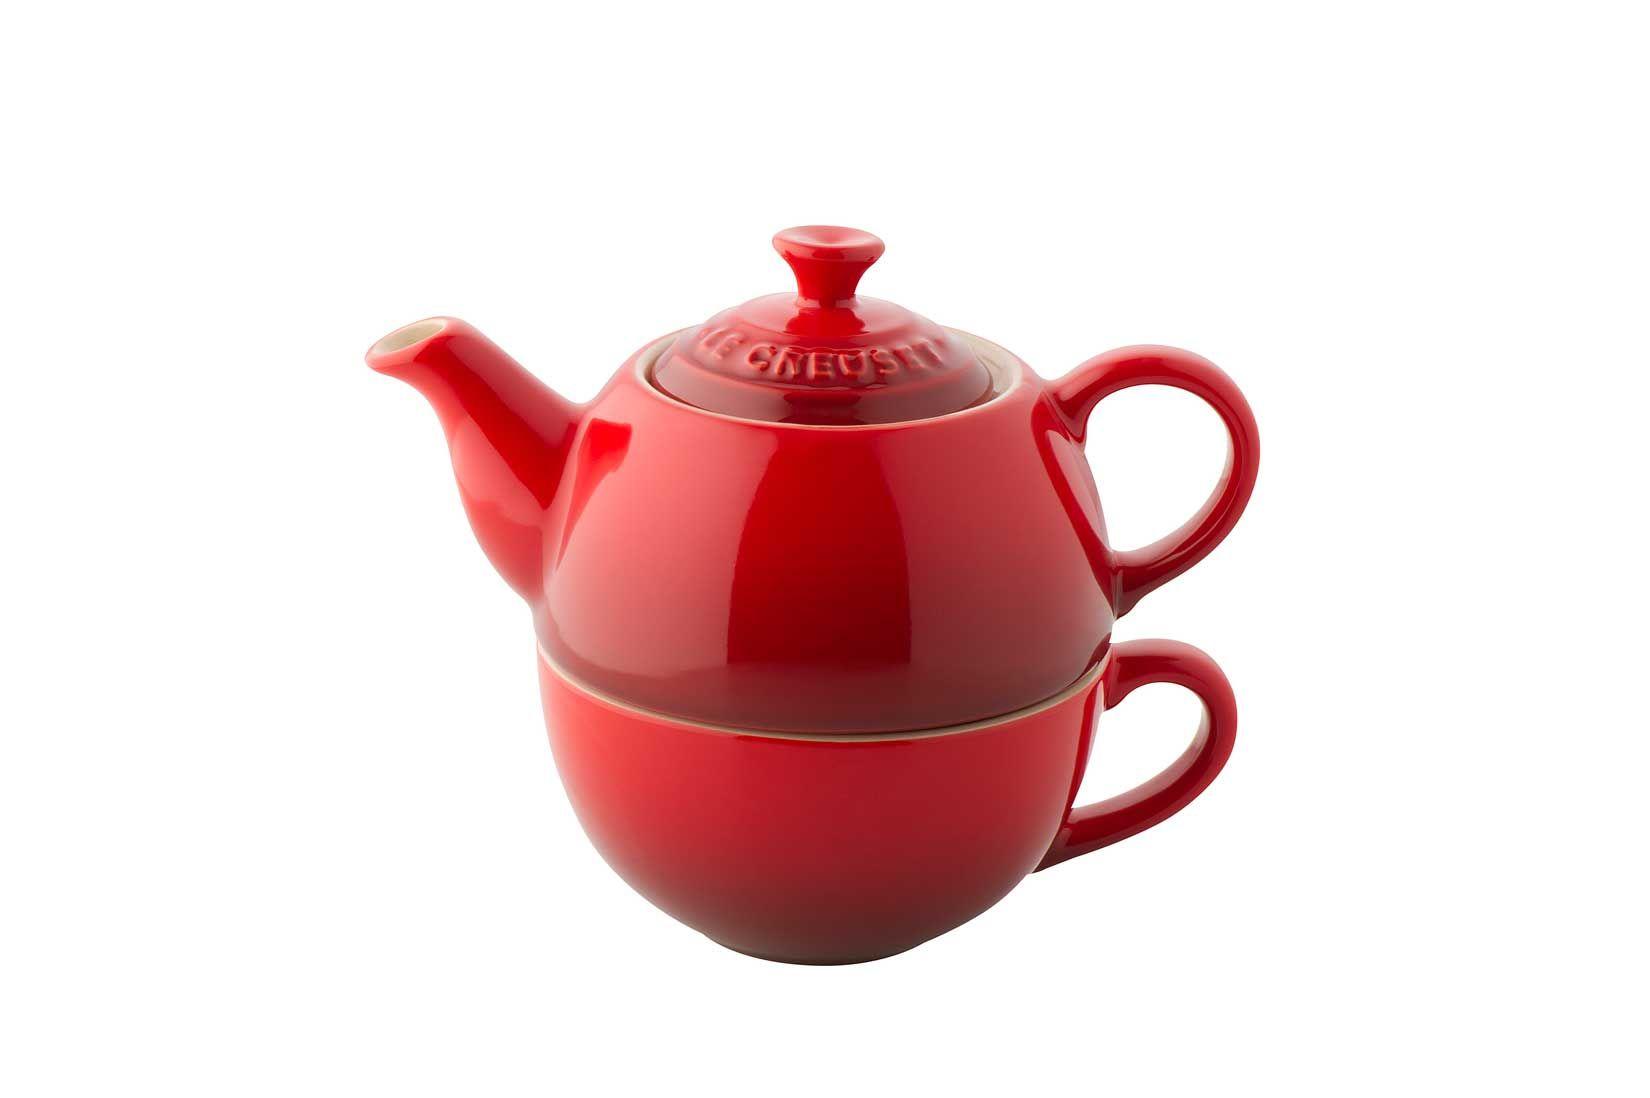 Le Creuset Stoneware Tea For One In Cerise